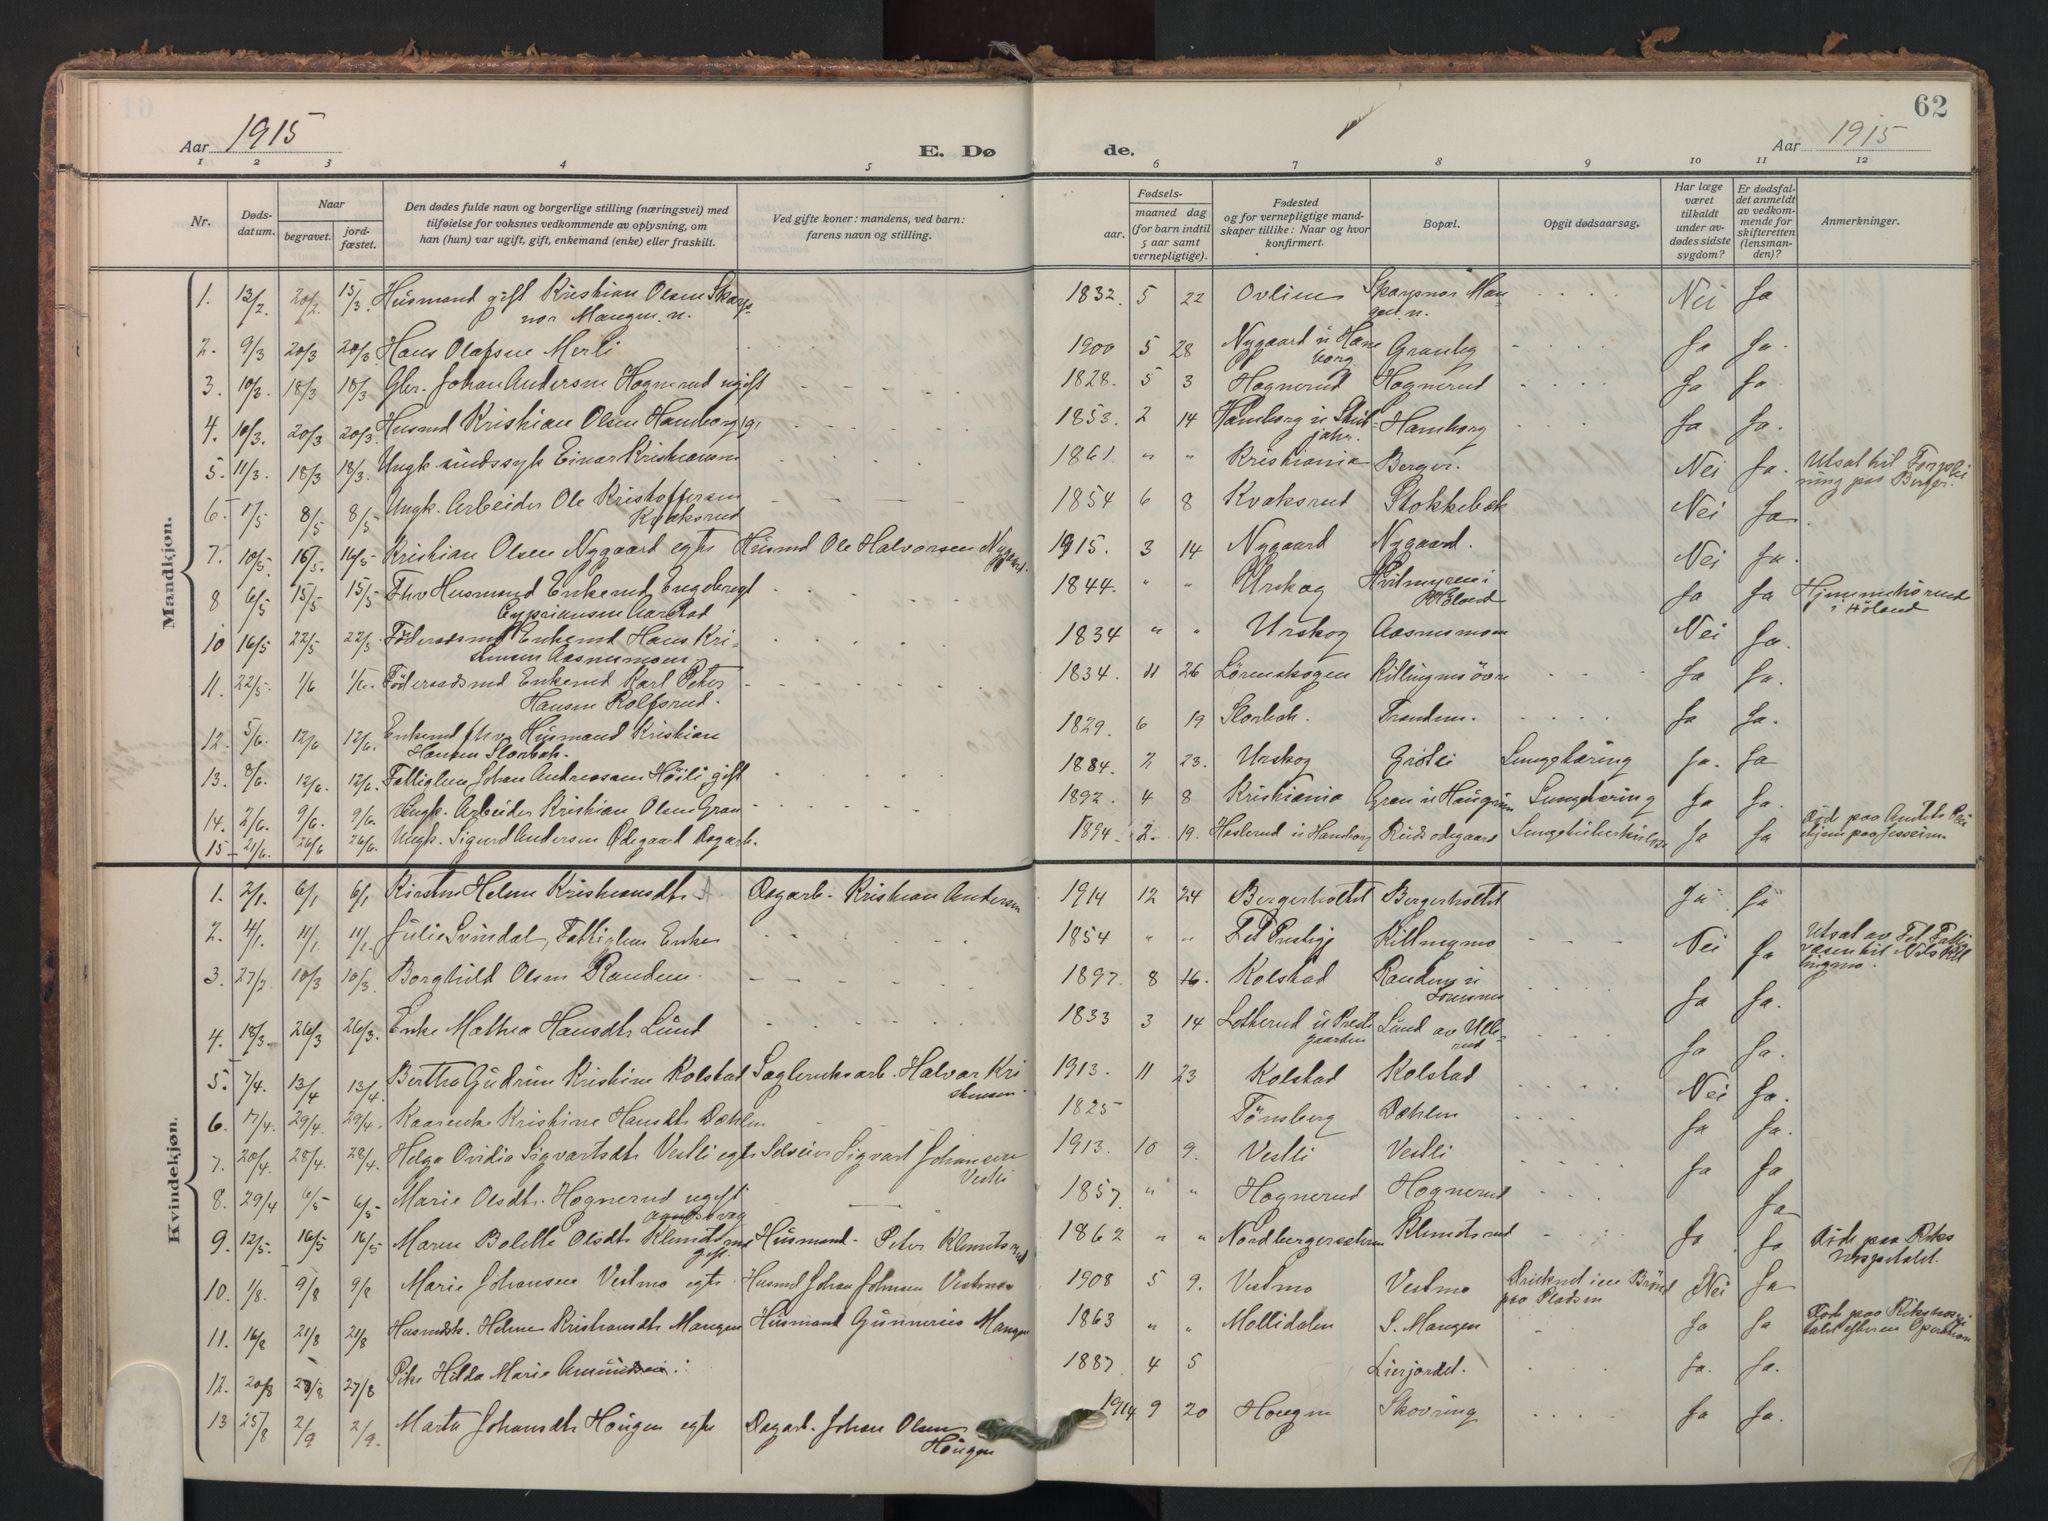 SAO, Aurskog prestekontor Kirkebøker, F/Fa/L0016: Parish register (official) no. I 16, 1910-1934, p. 62